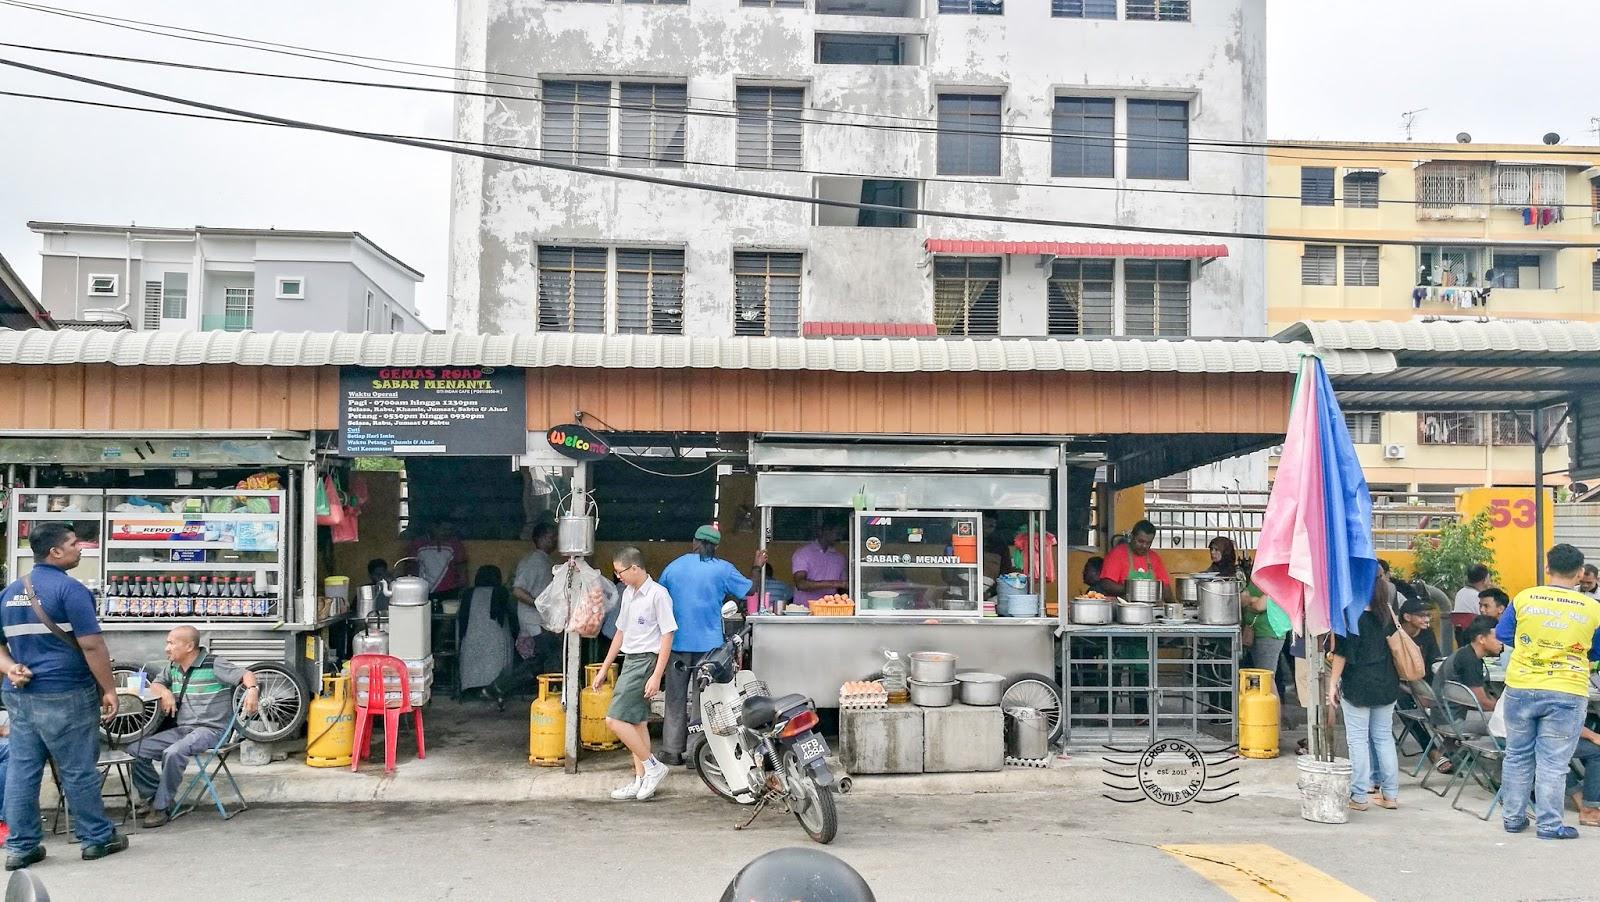 Roti Canai | Gemas Road Sabar Menanti @ Jalan Gemas, Georgetown, Penang